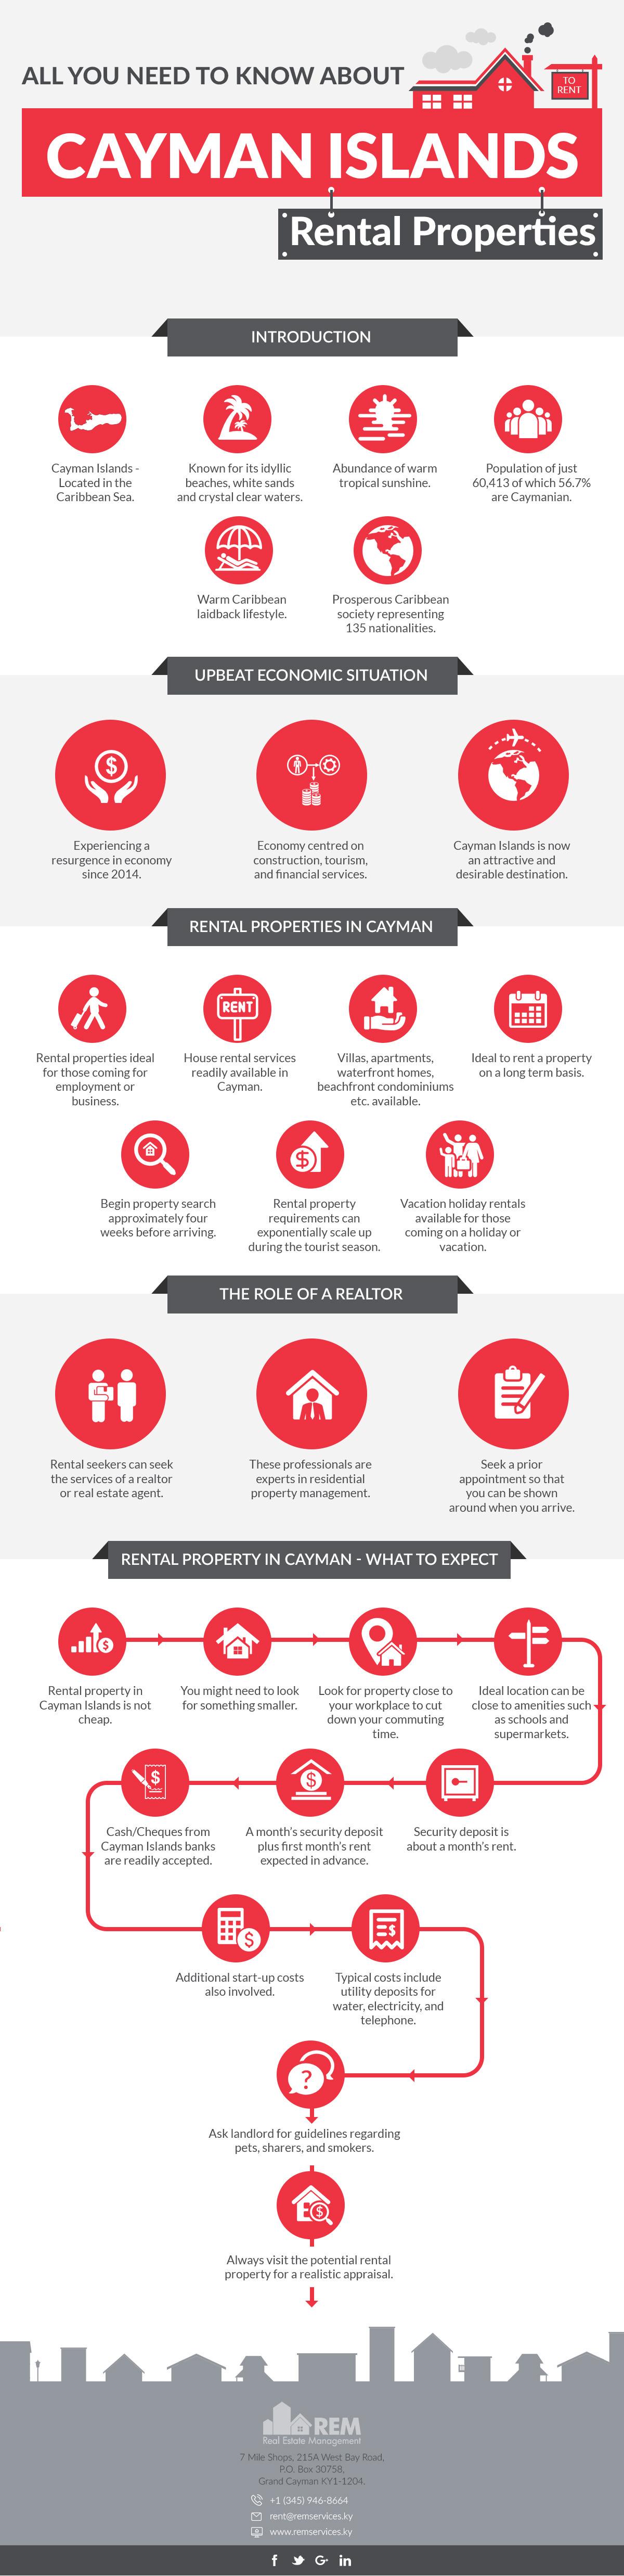 Cayman Islands Rental Properties